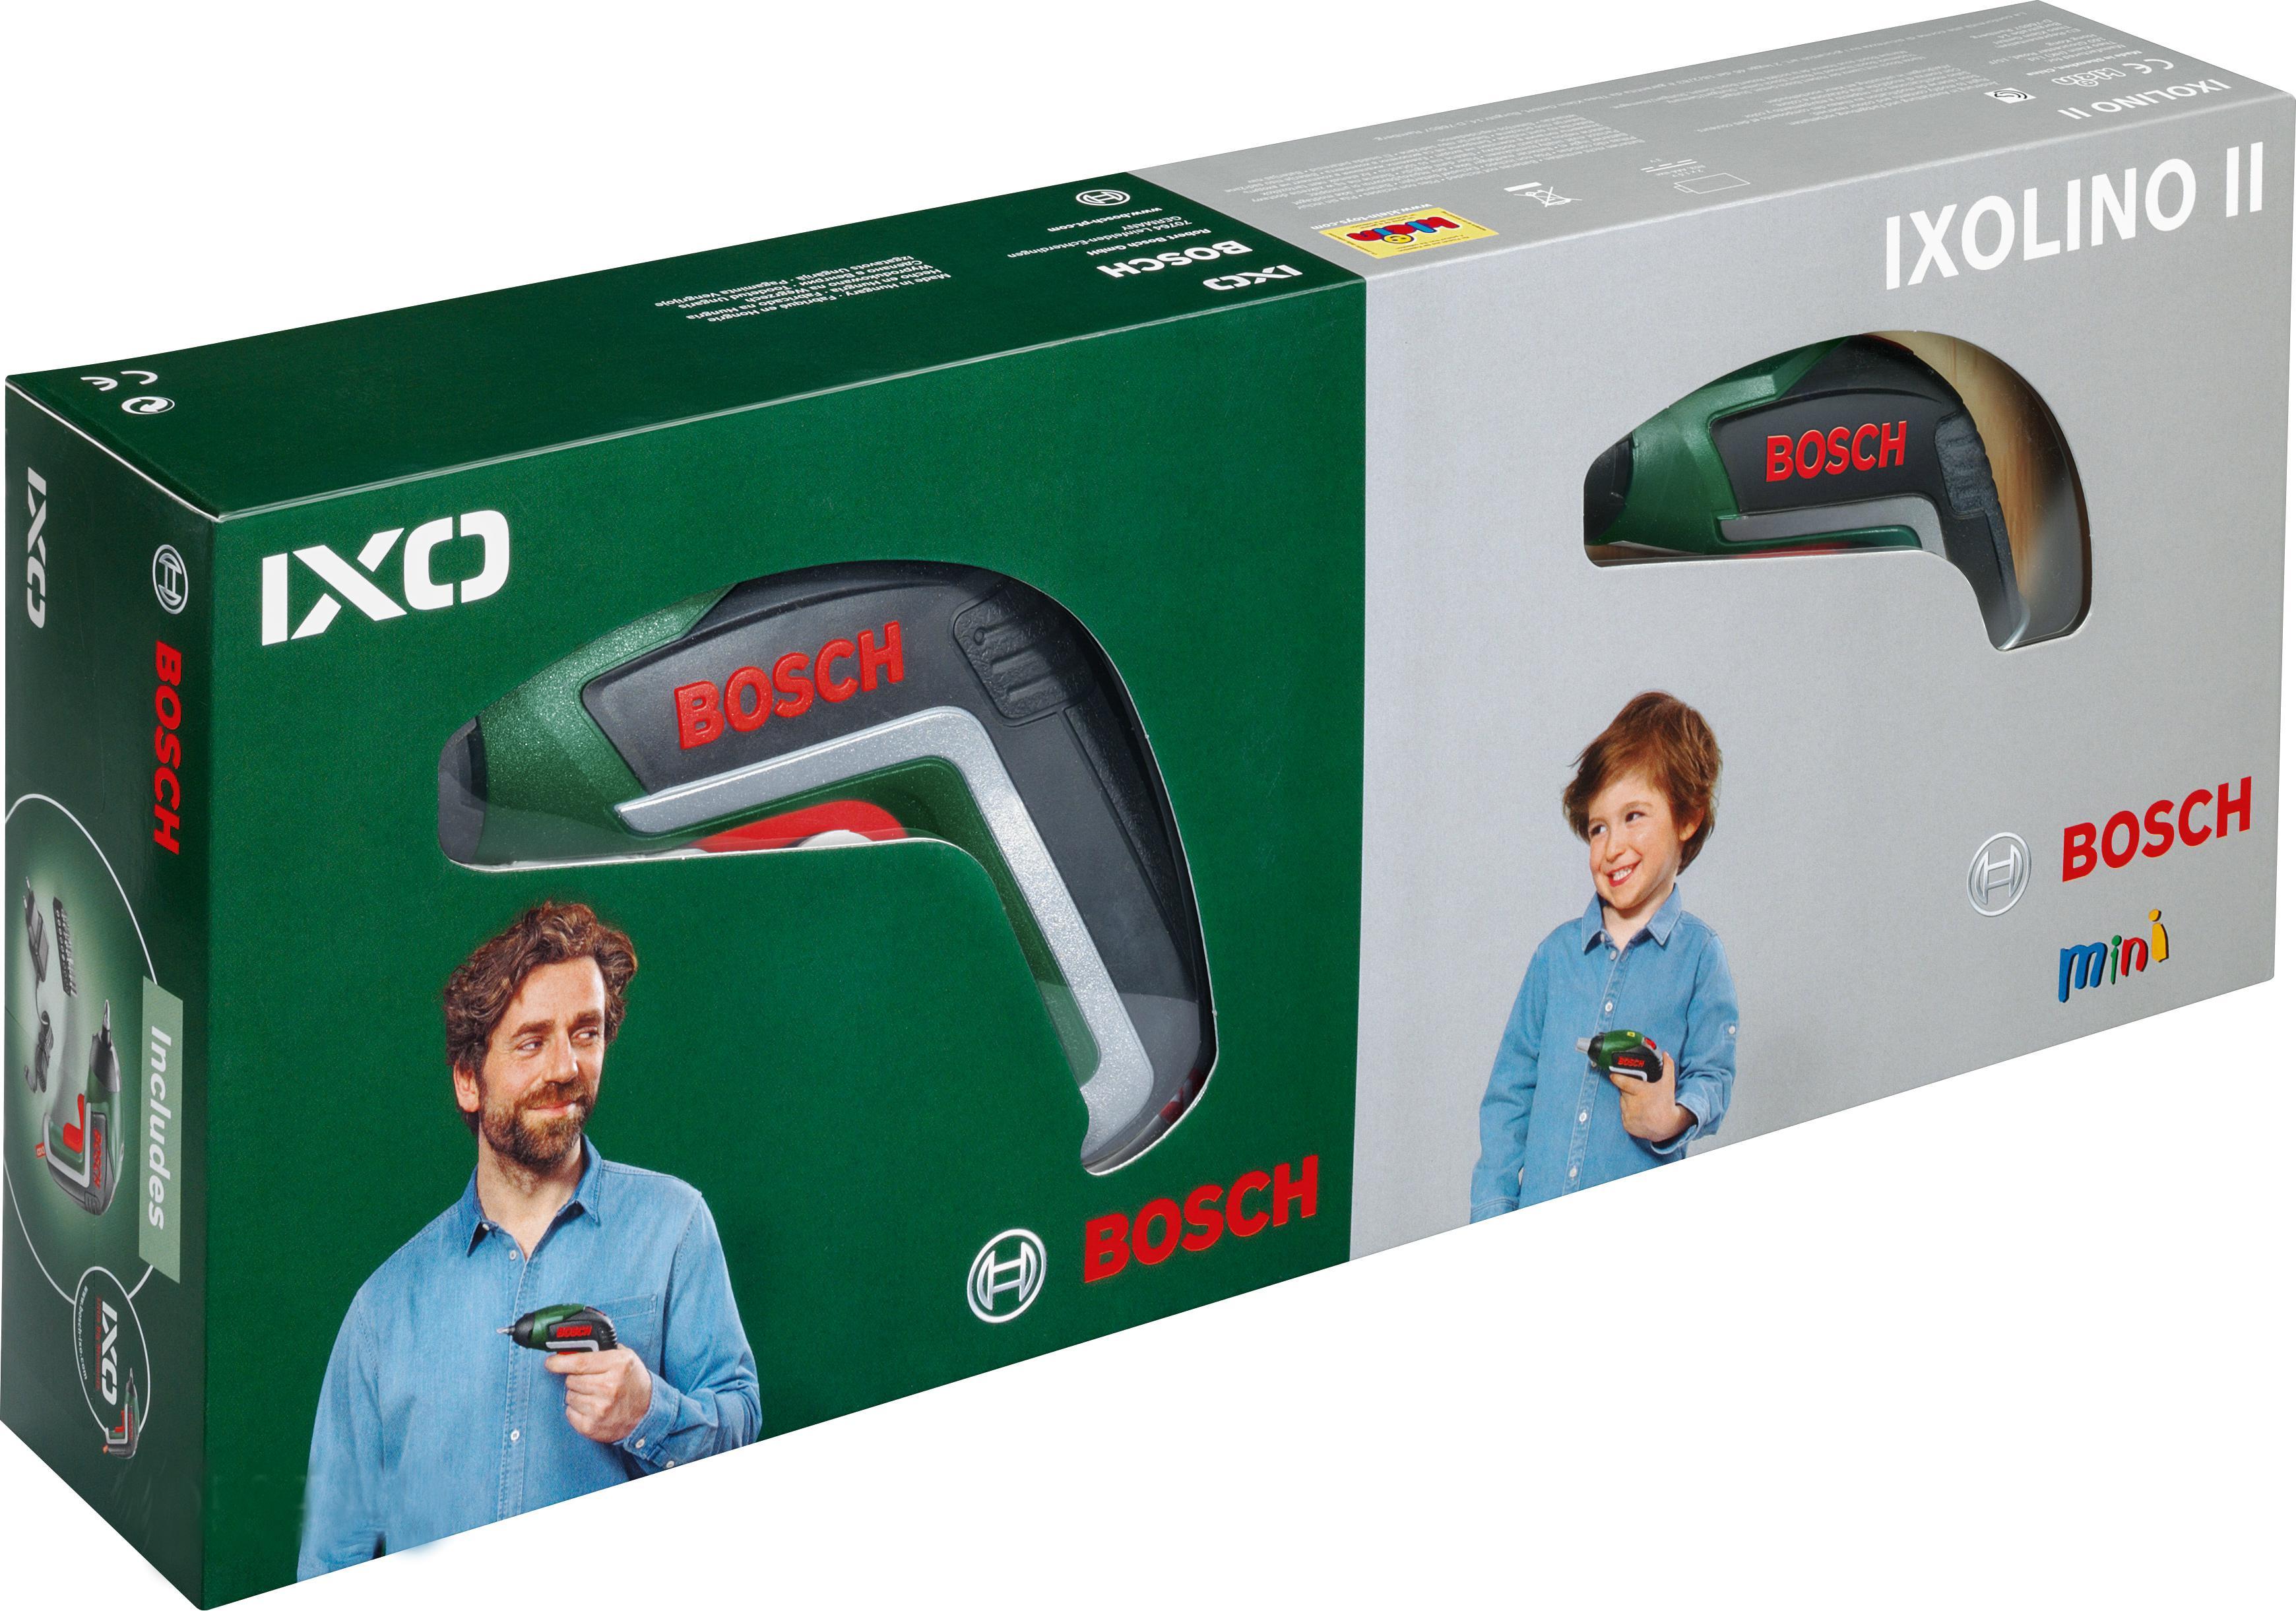 Шуруповерт Bosch Ixo+ixolino (0.603.9a8.00m)